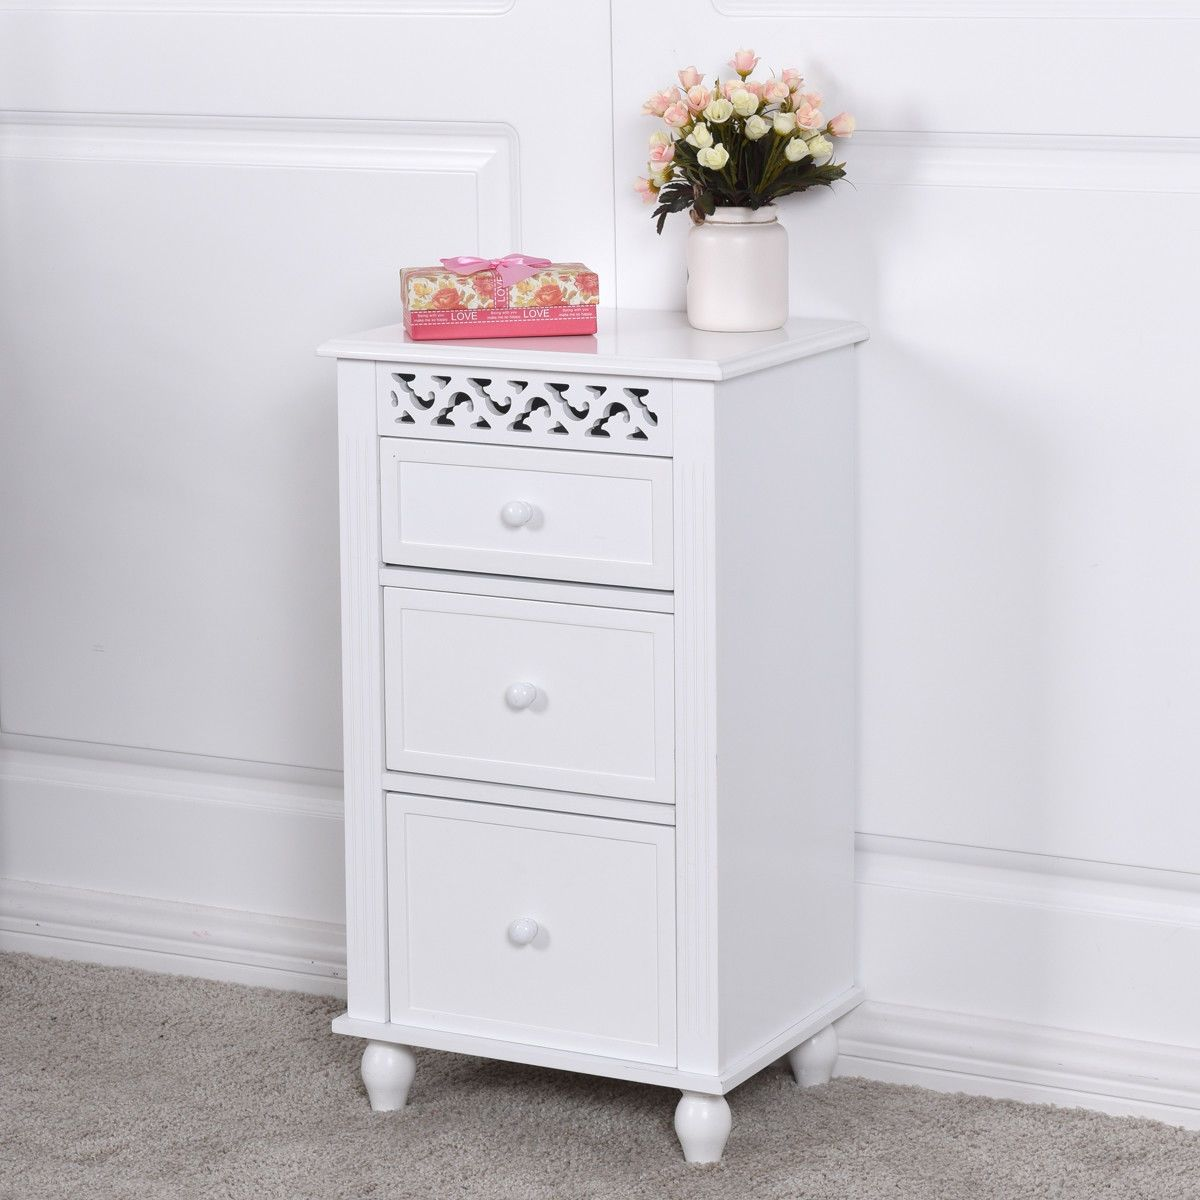 Bathroom Wood Collection Storage Organizer Floor Cabinet ...